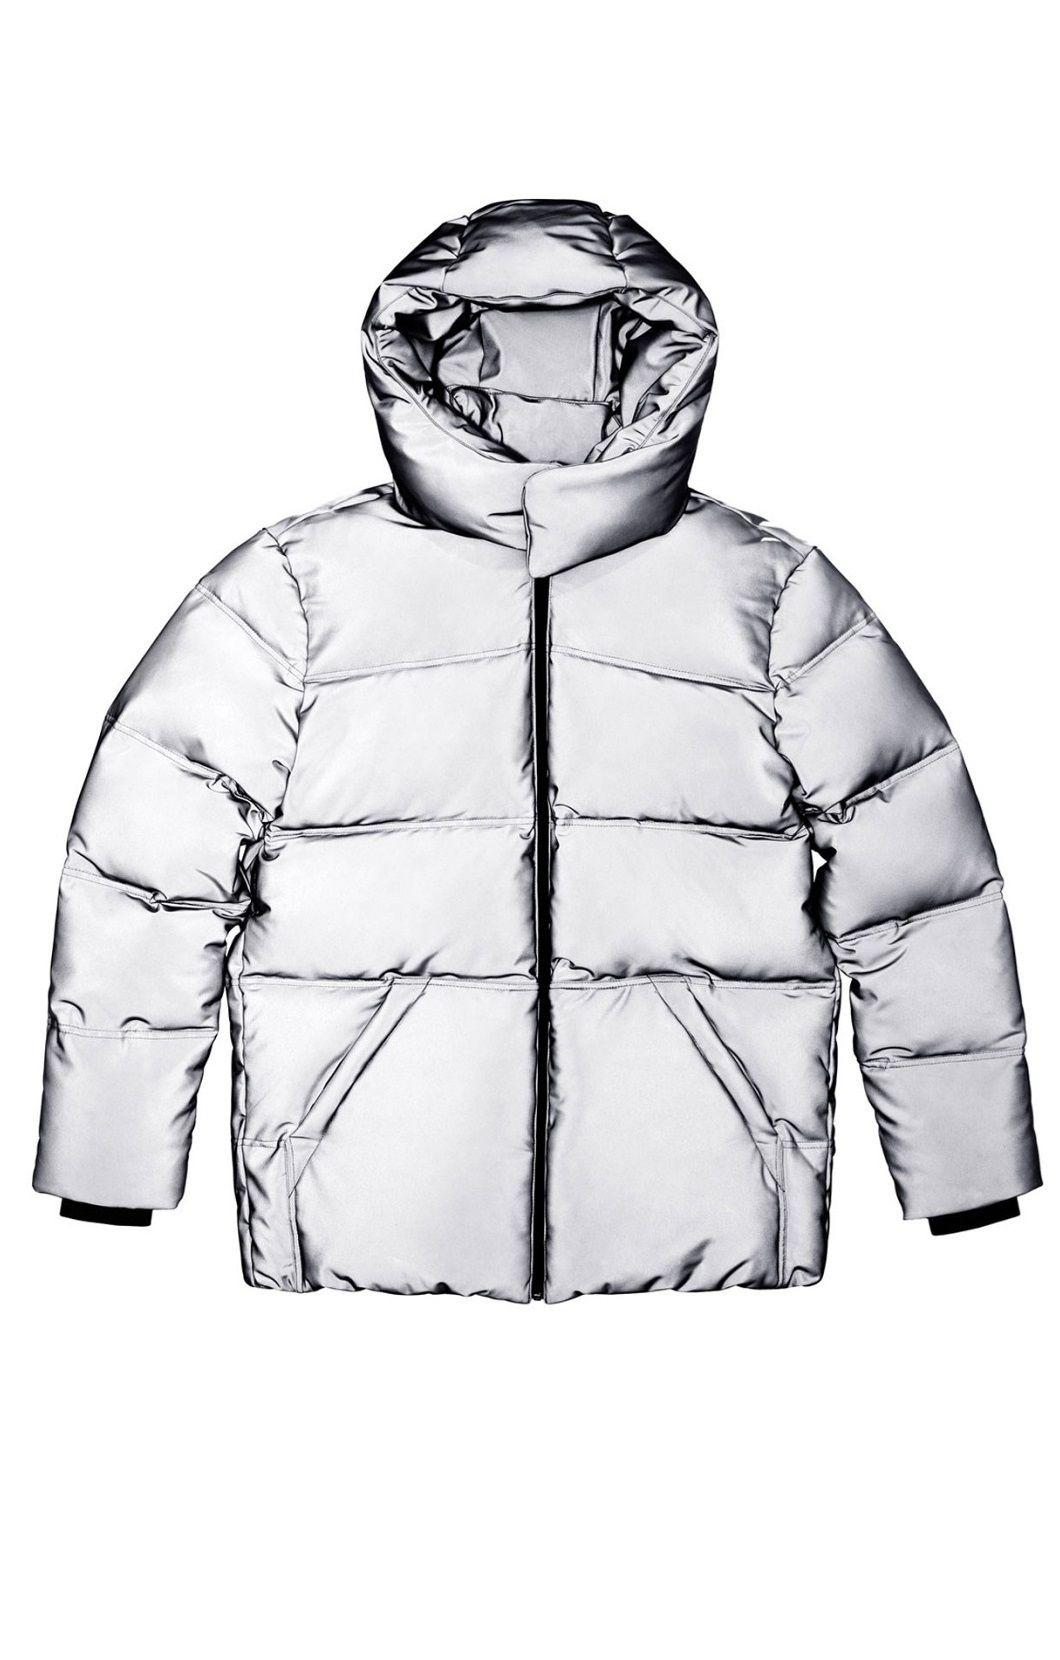 bd66aef66 Image result for alexander wang color blocked puffer jacket ...